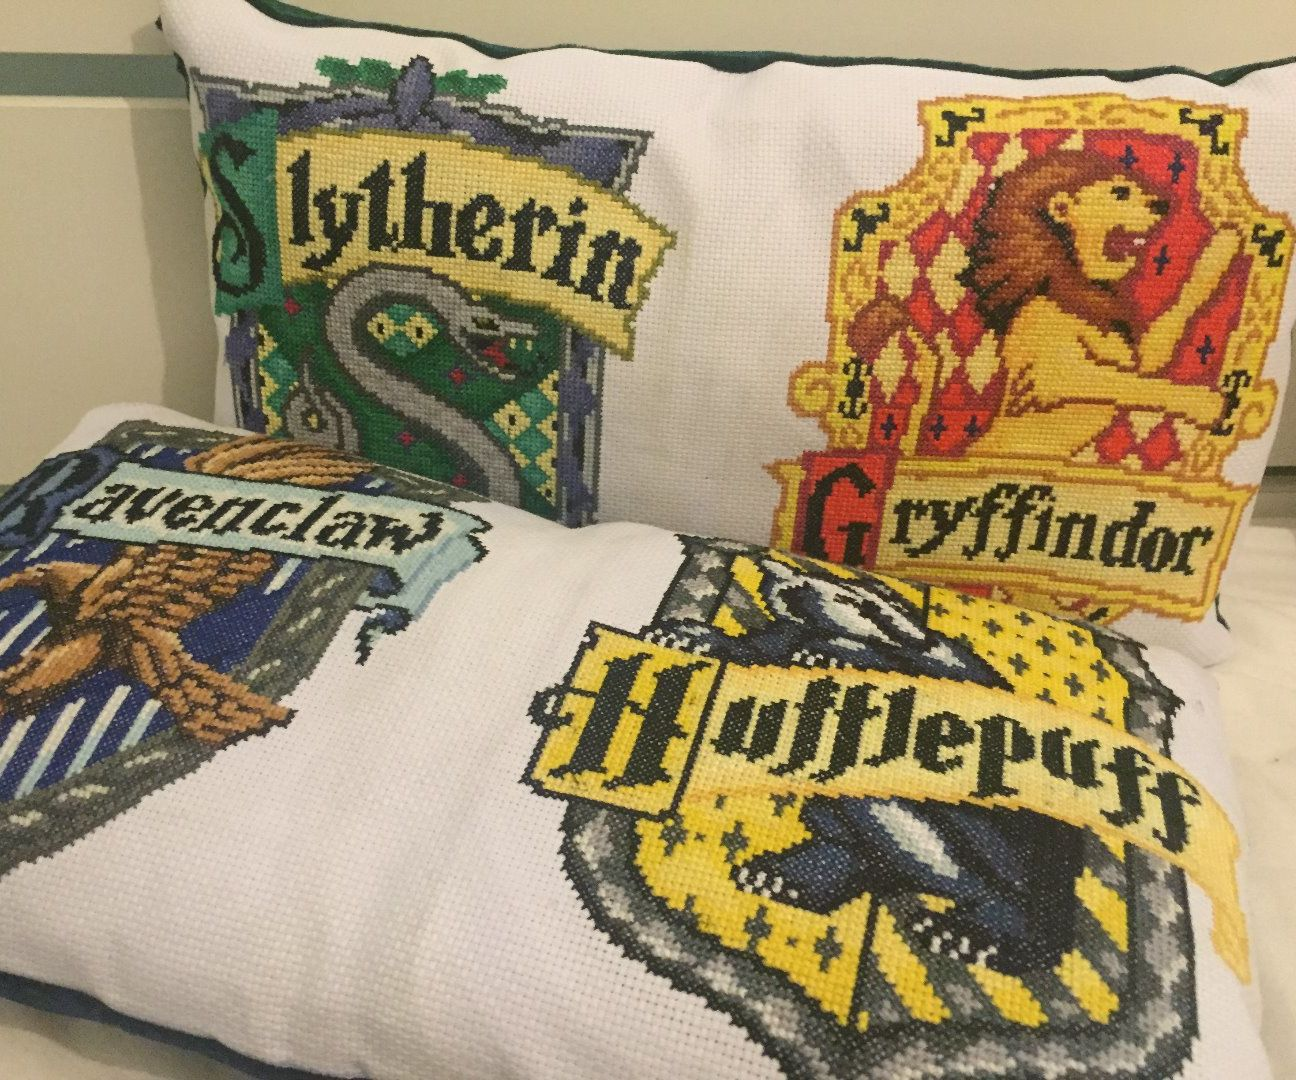 Harry Potter Cross-stitch Pillows